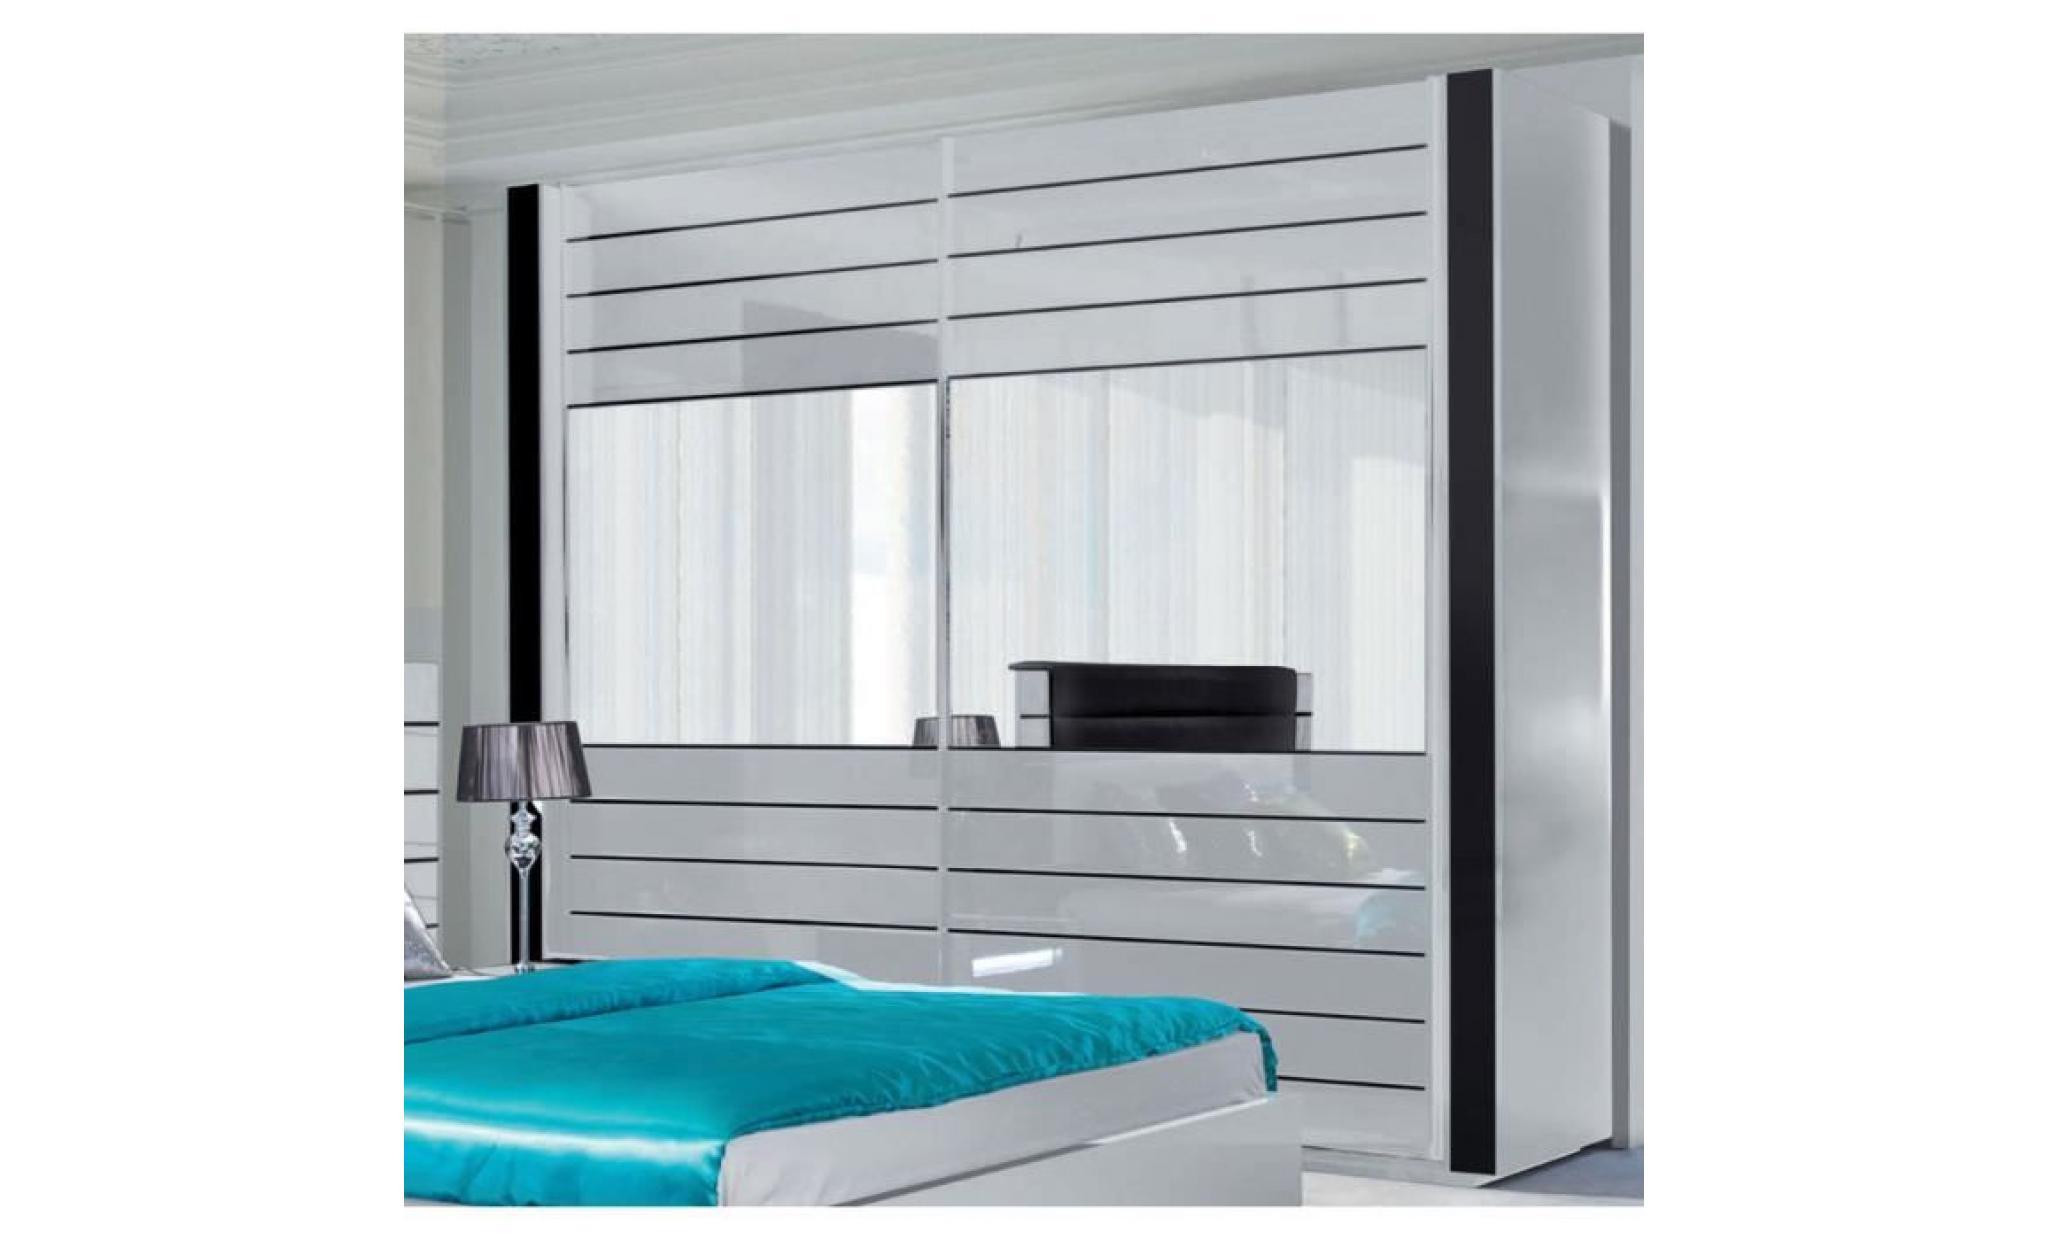 Chambre coucher compl te lina blanche et noire laqu e for Meuble chambre complete